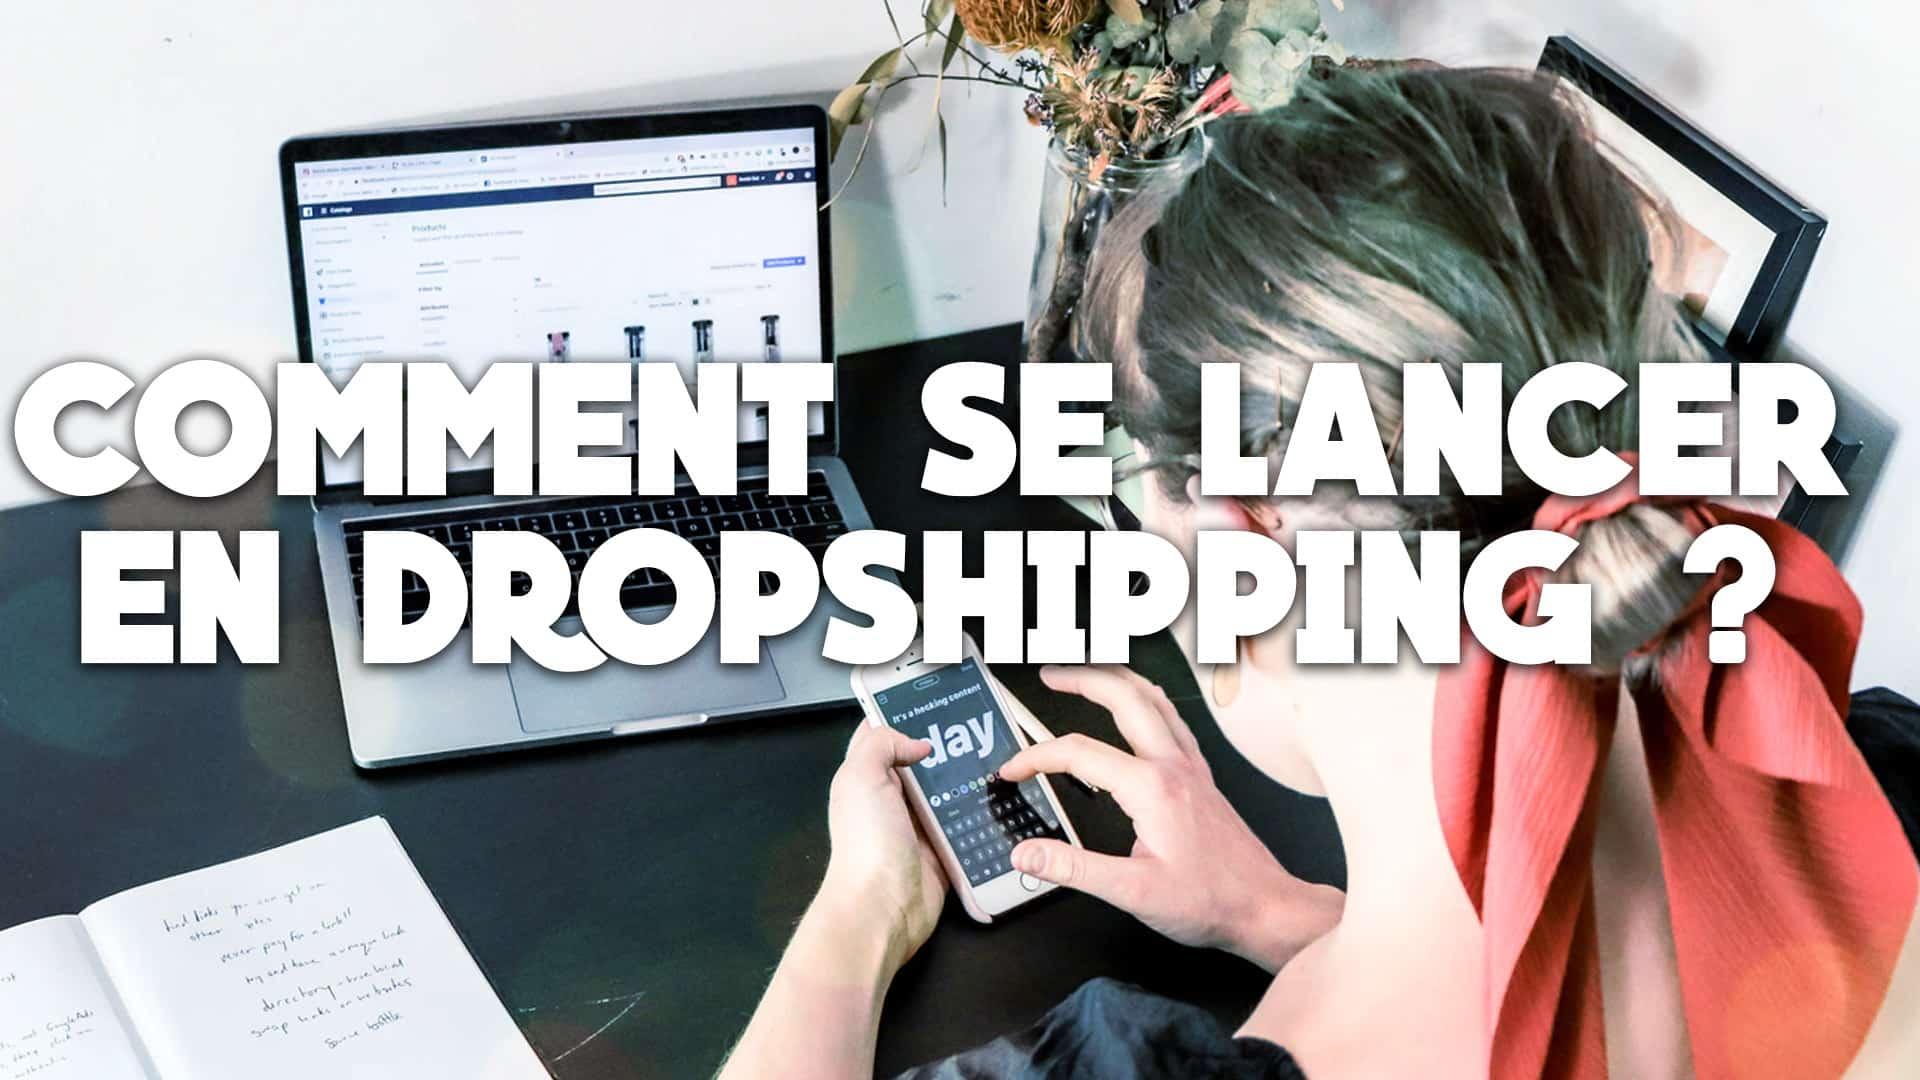 Comment se lancer en dropshipping en 5 étapes ?